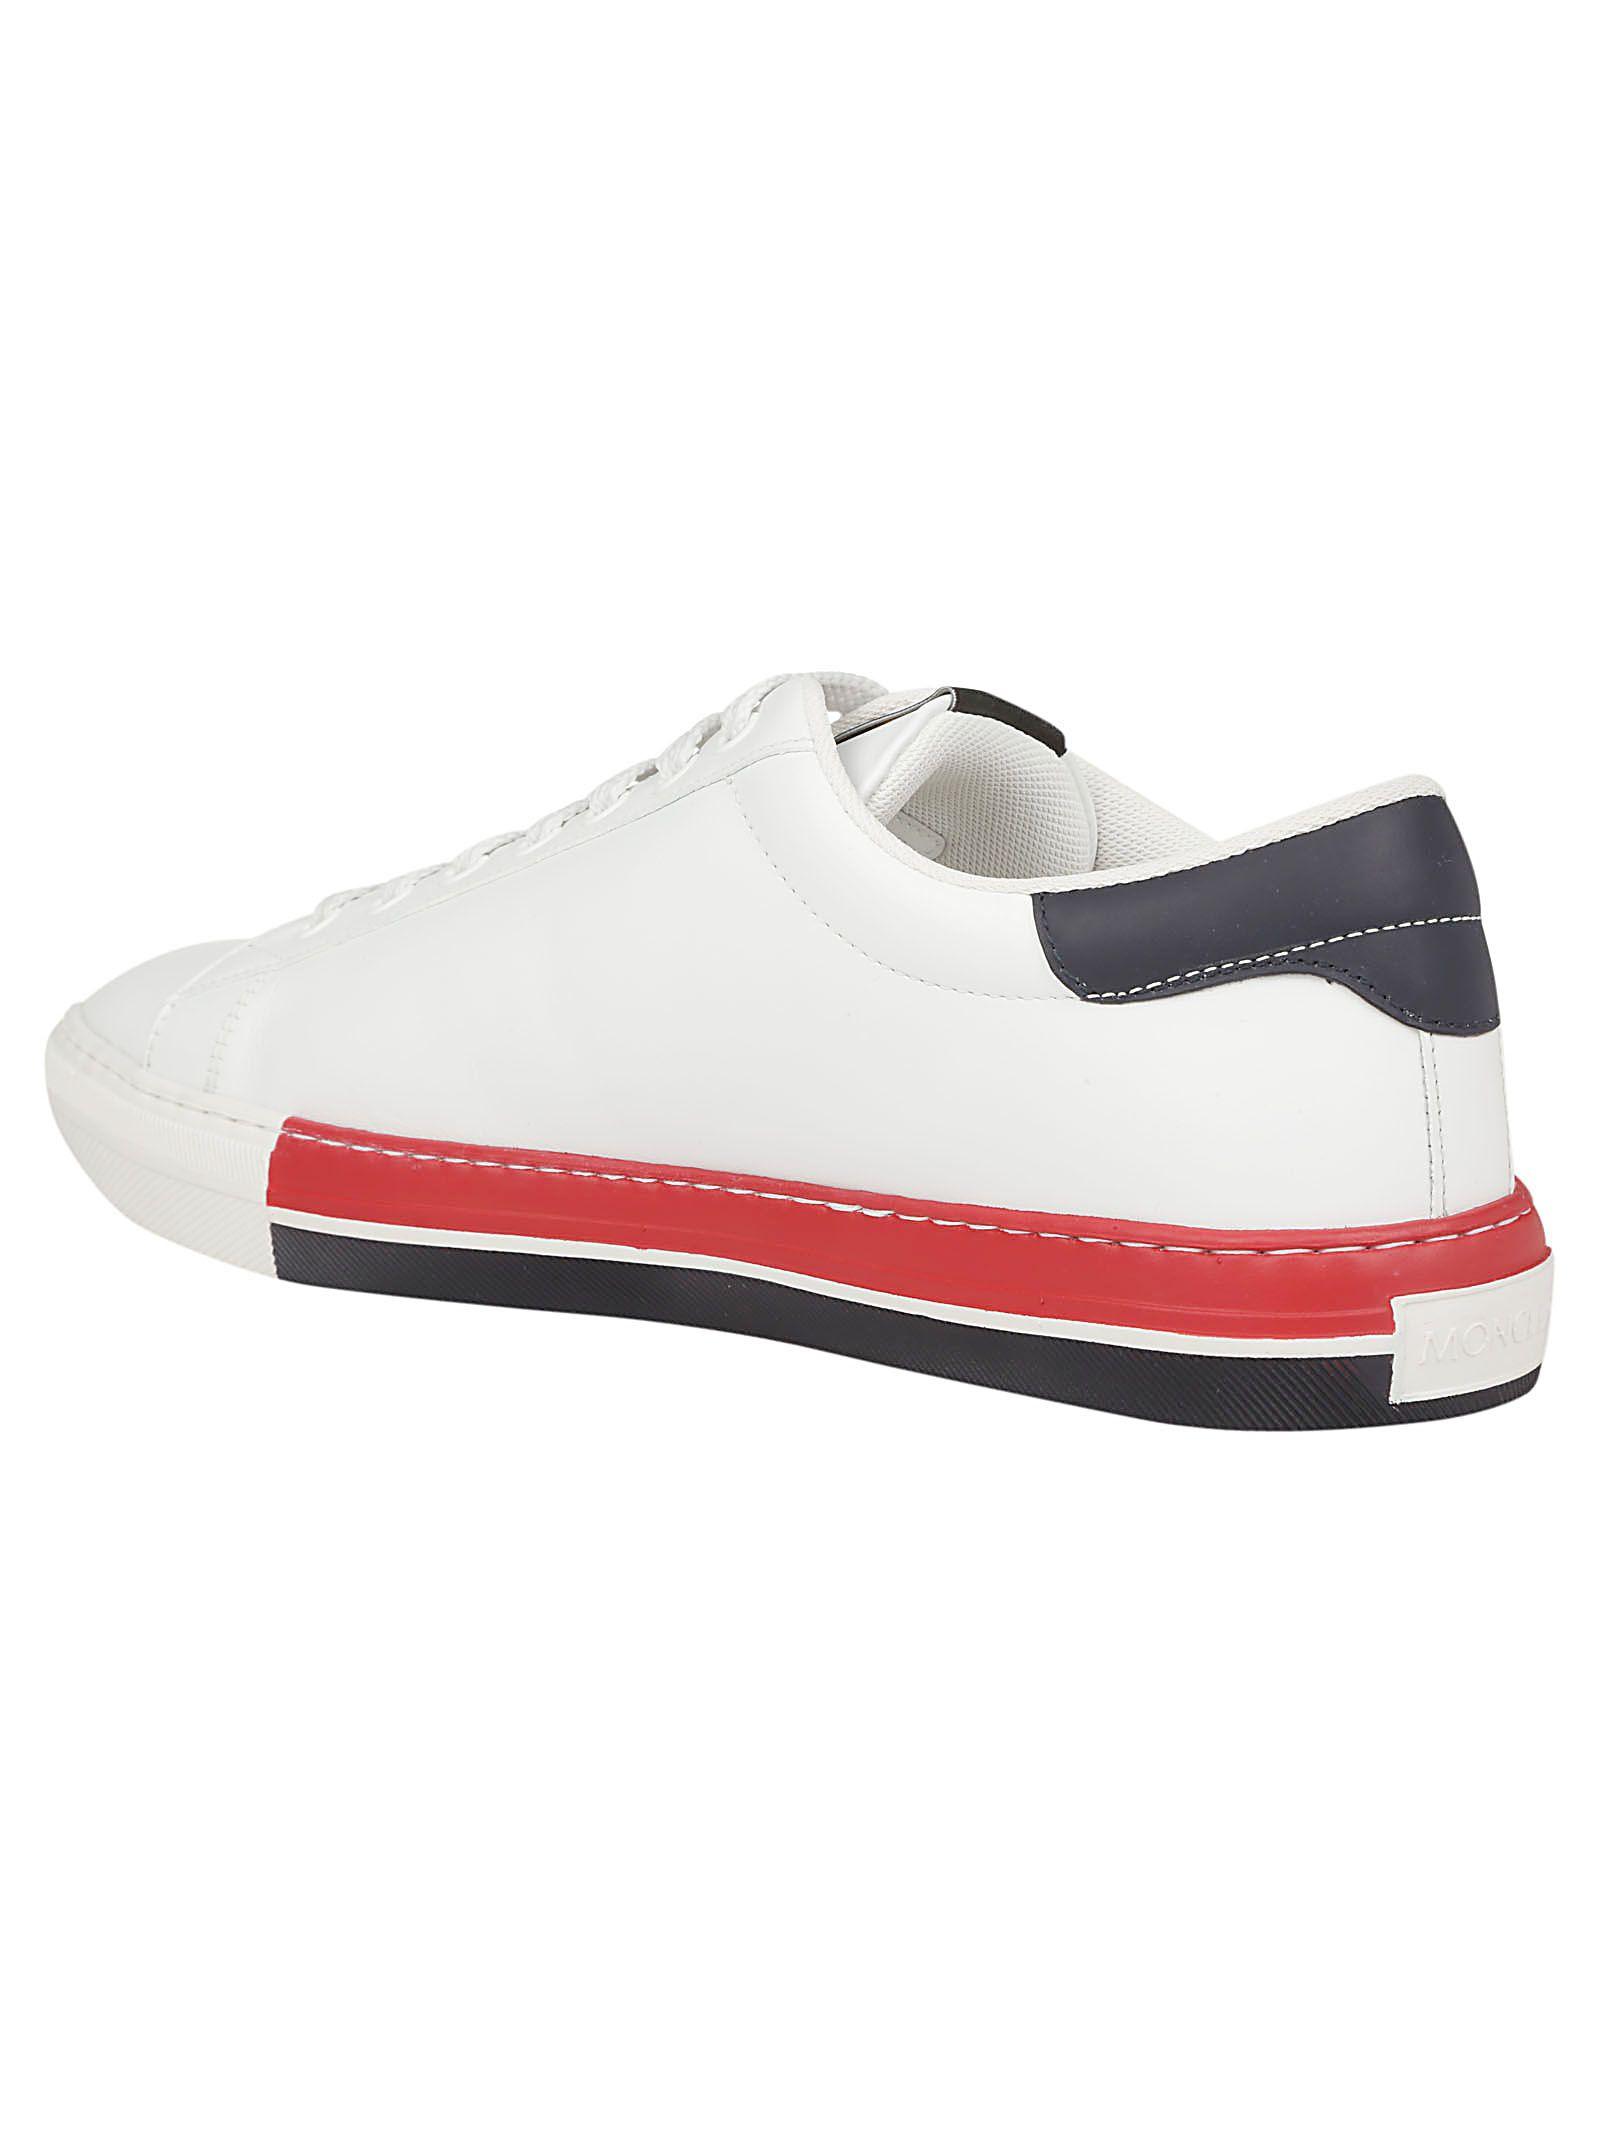 0b0a58b4ce2d Moncler Moncler Montpellier Sneaker - 002 - 10815033   italist